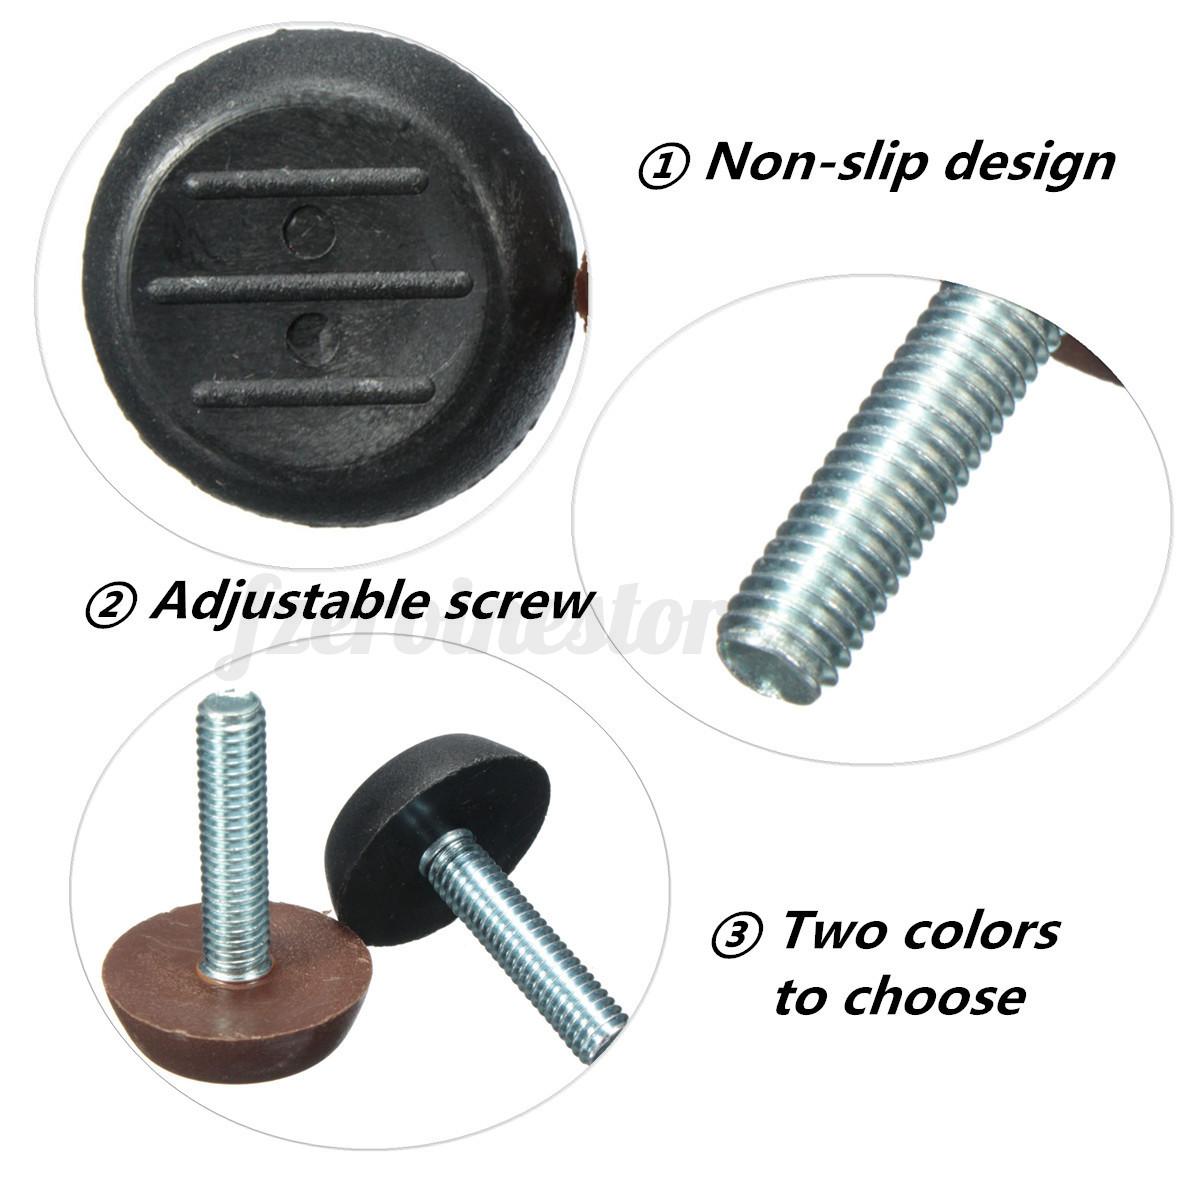 M mm adjustable screw threaded glide feet leveling